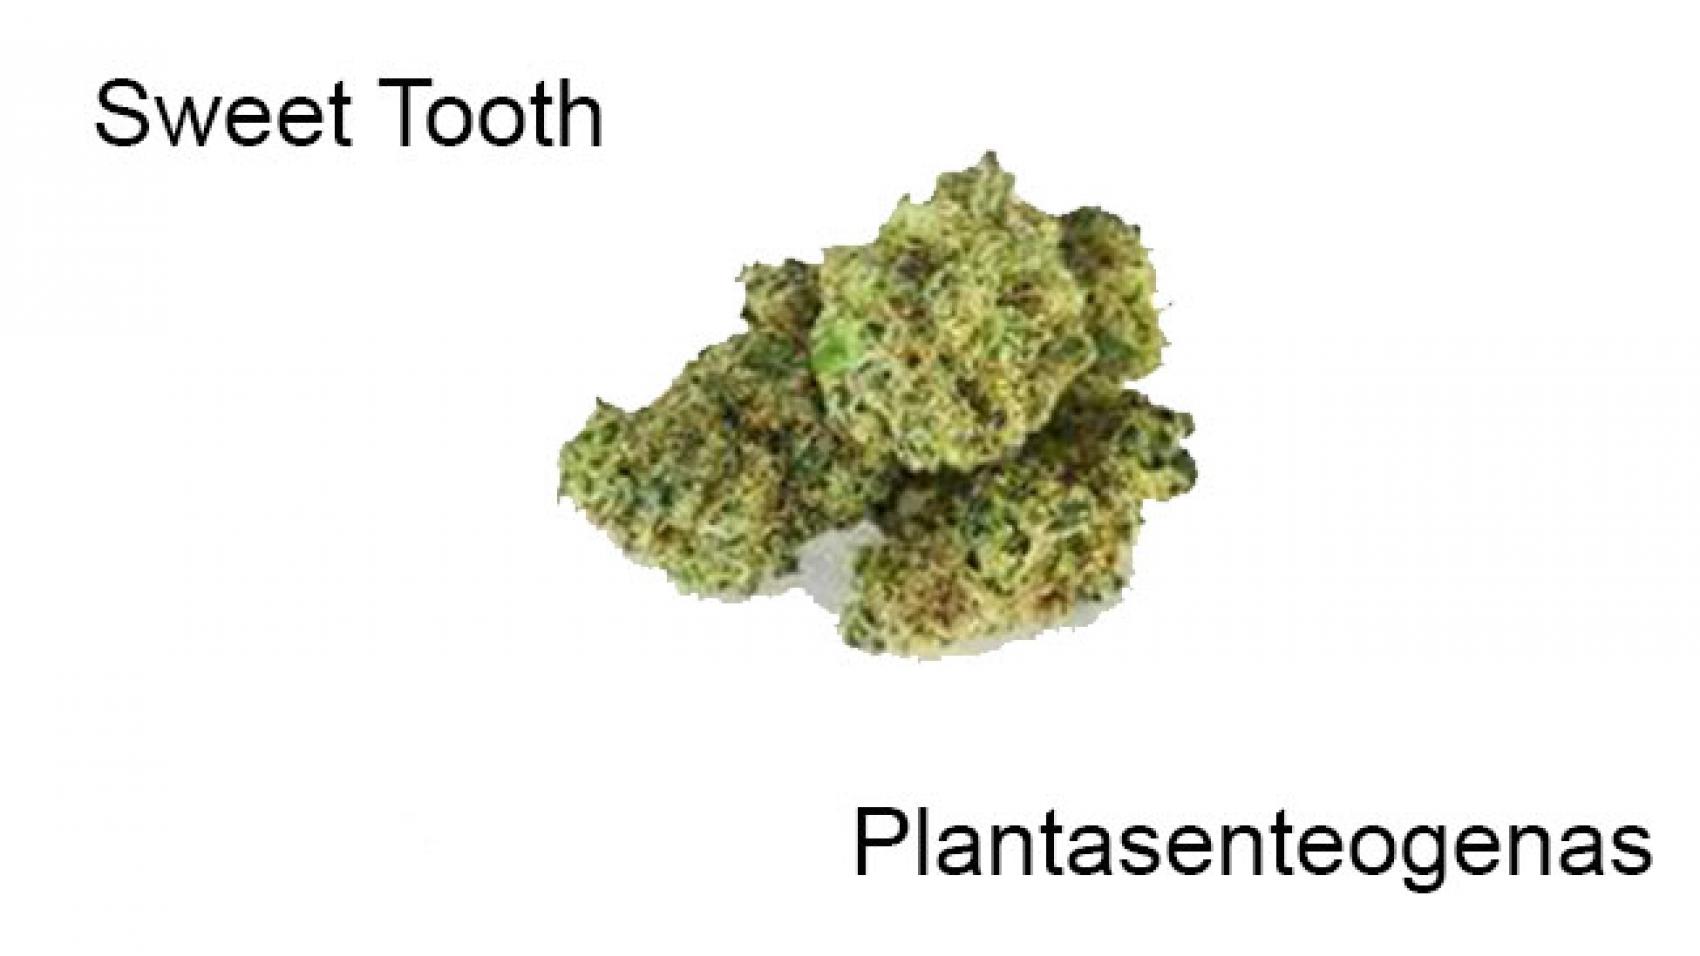 plantasenteogenas